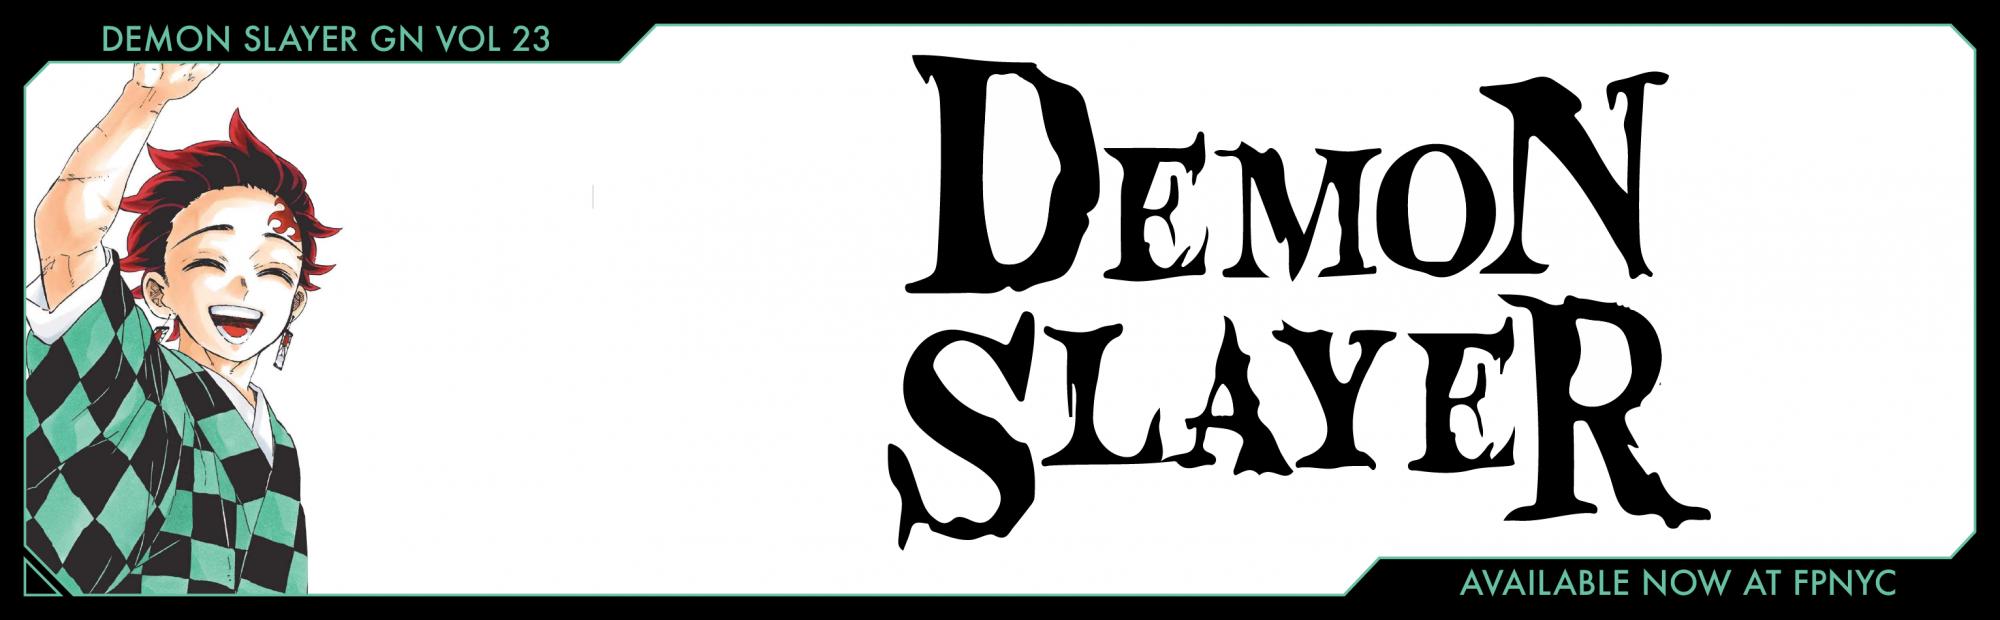 Demon Slayer Vol 23